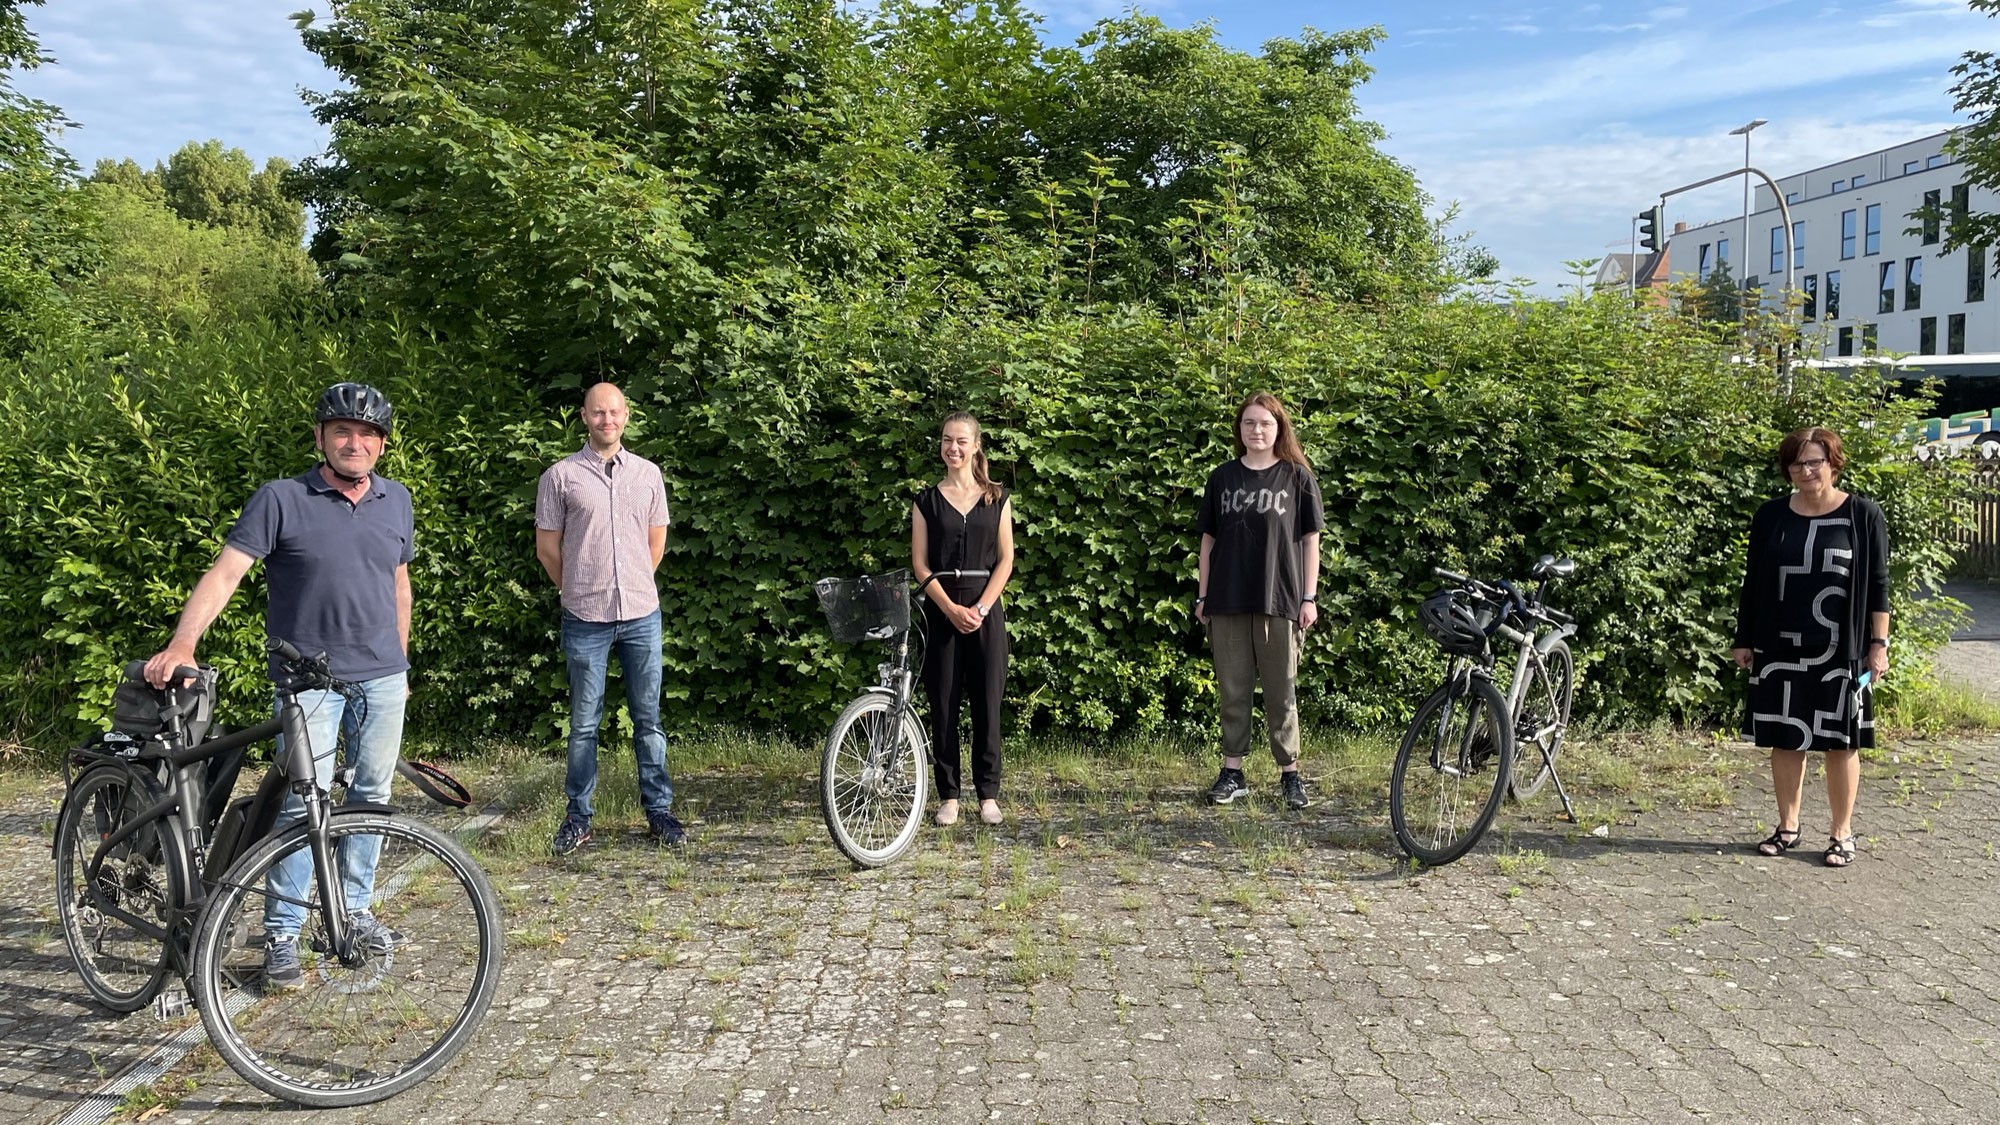 Graf-Stauffenberg-Realschule nimmt an Stadtradel-Aktion teil